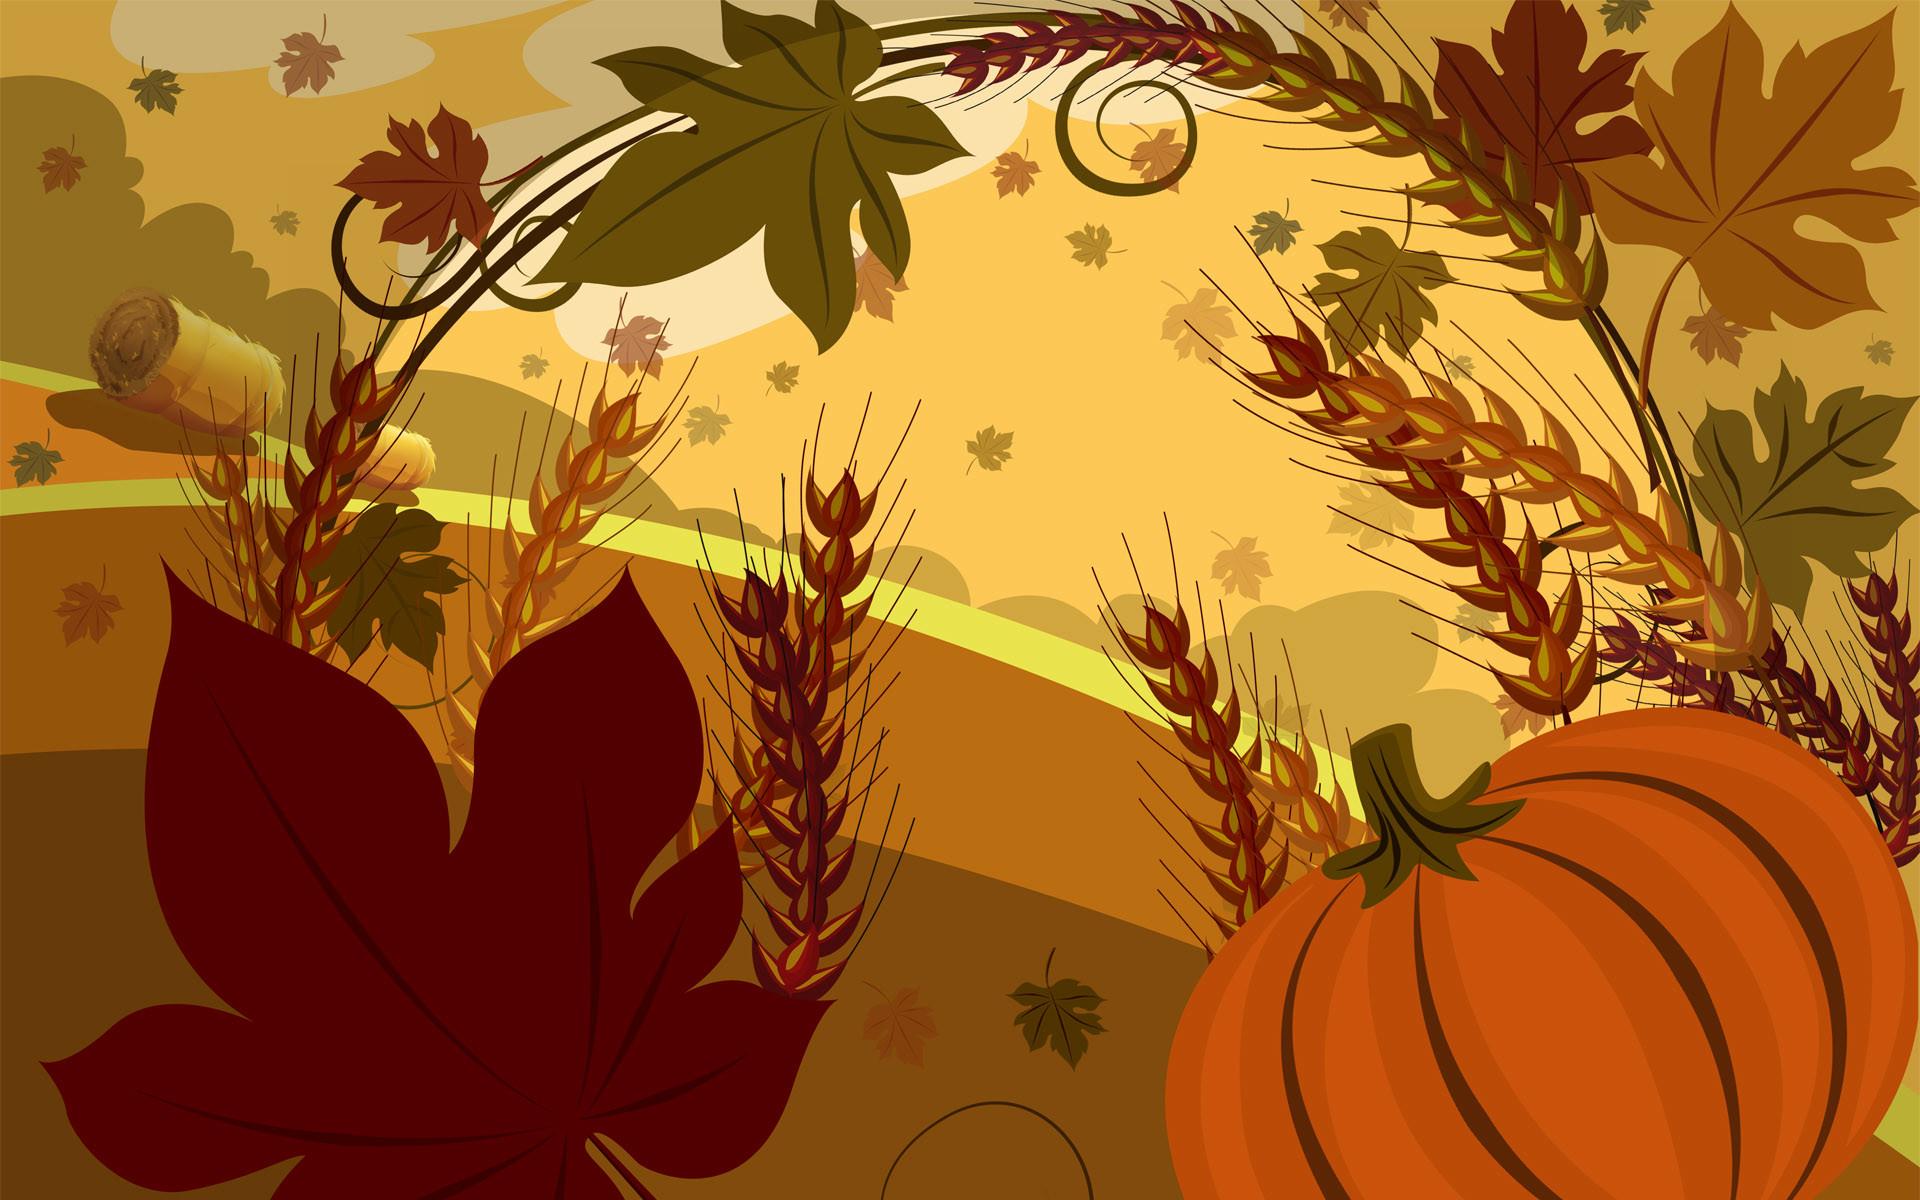 Free Desktop Wallpapers Thanksgiving Wallpaper | HD Wallpapers | Pinterest  | Thanksgiving wallpaper, Wallpaper and Wallpaper backgrounds